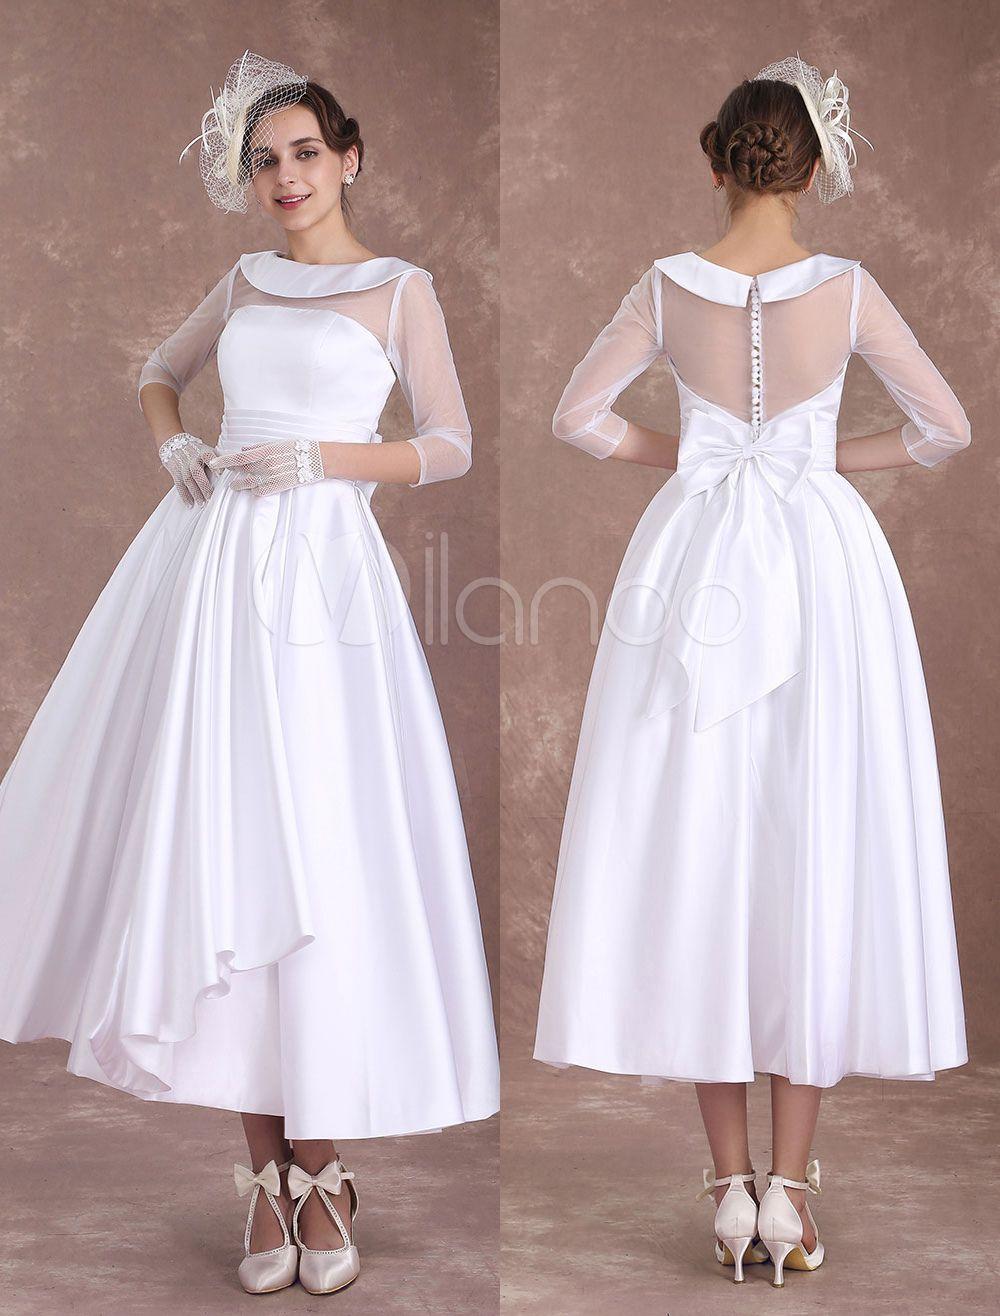 White Wedding Dresses Short 1950 S Vintage Bridal Dress Satin Long Sleeve Pleated Illusion T Short Wedding Dress Wedding Reception Dress Bridal Dresses Vintage [ 1316 x 1000 Pixel ]